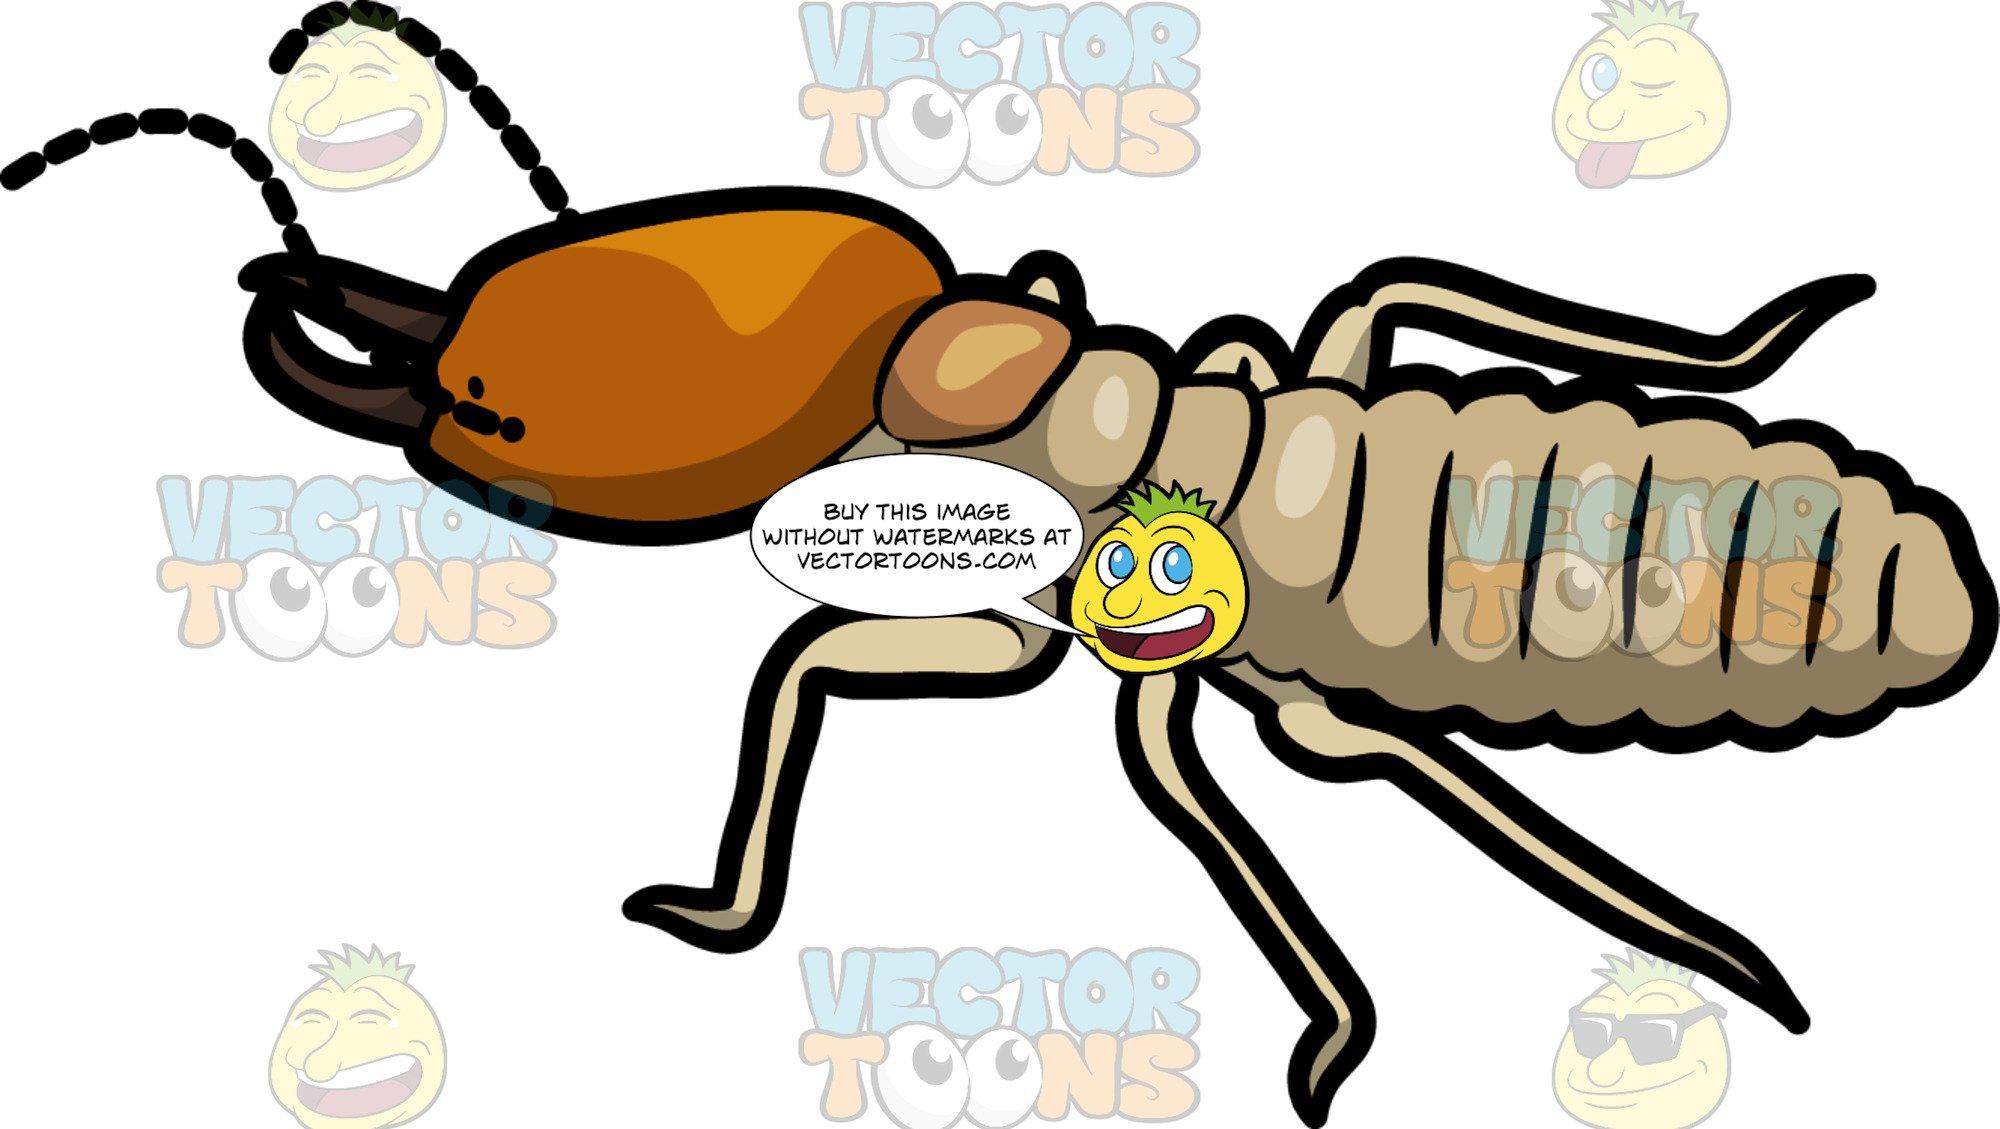 Clipart termites image download A Regular Termite image download